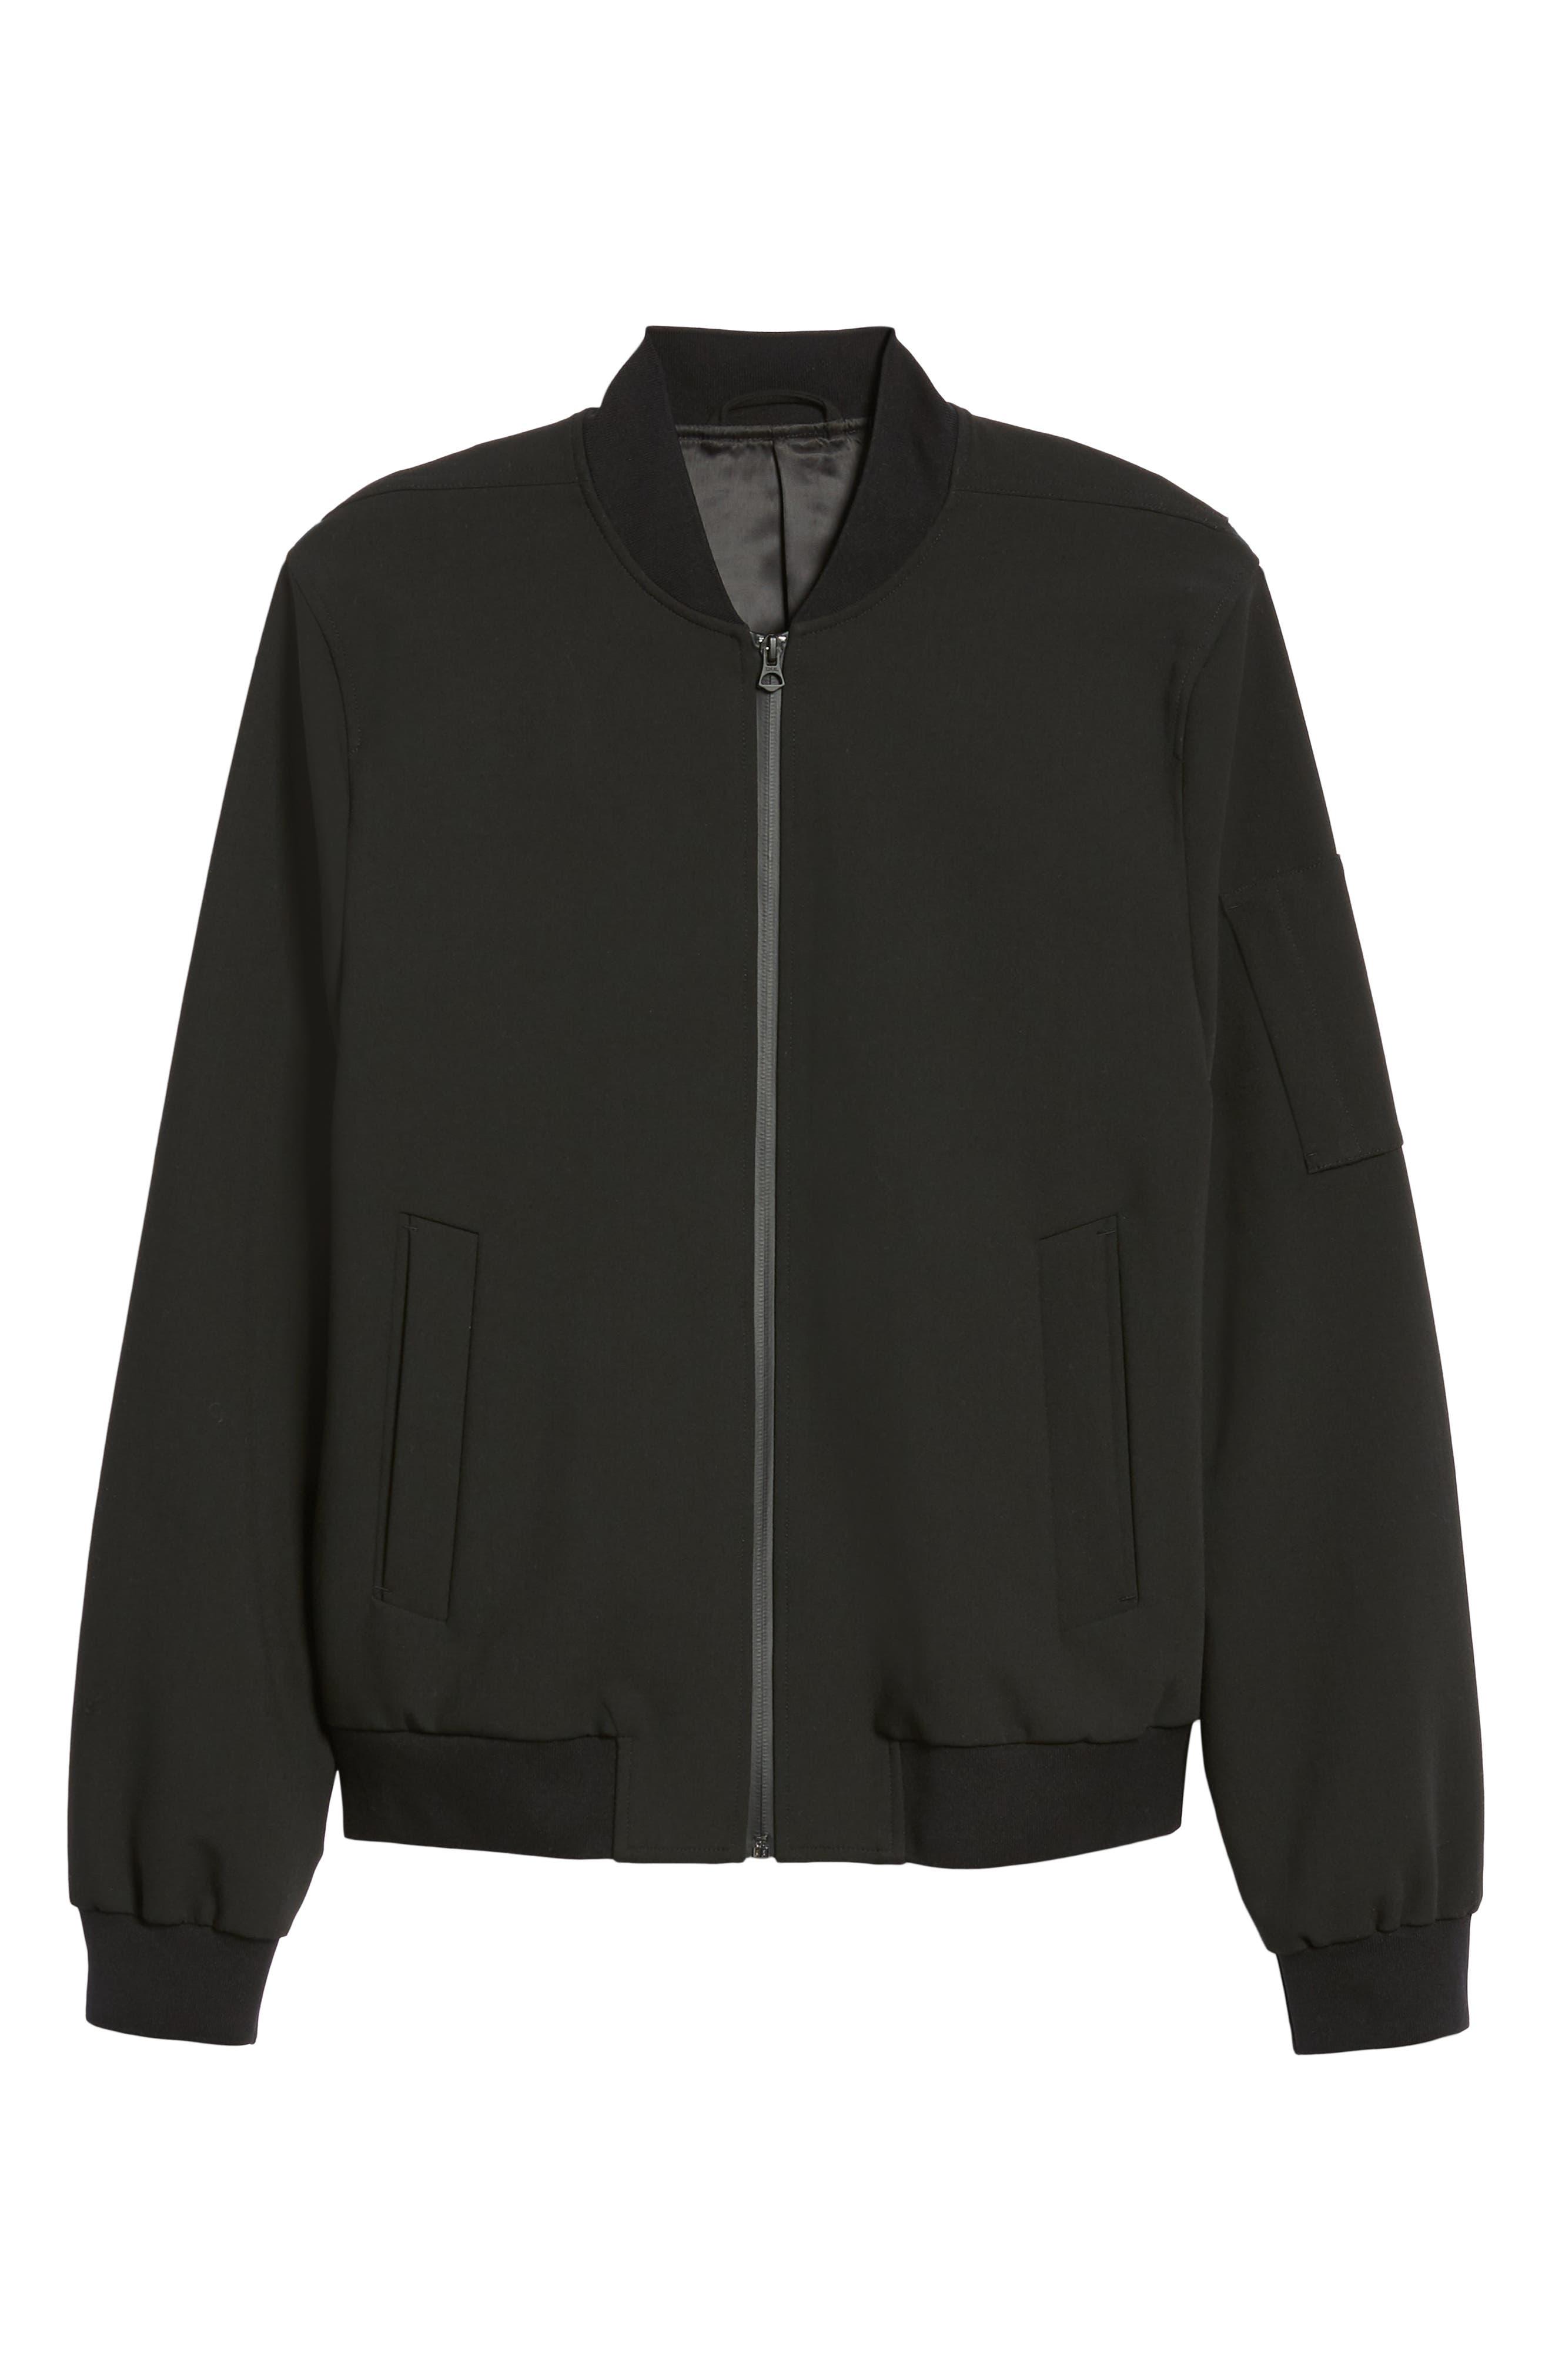 Regular Fit Bomber Jacket,                             Alternate thumbnail 5, color,                             001